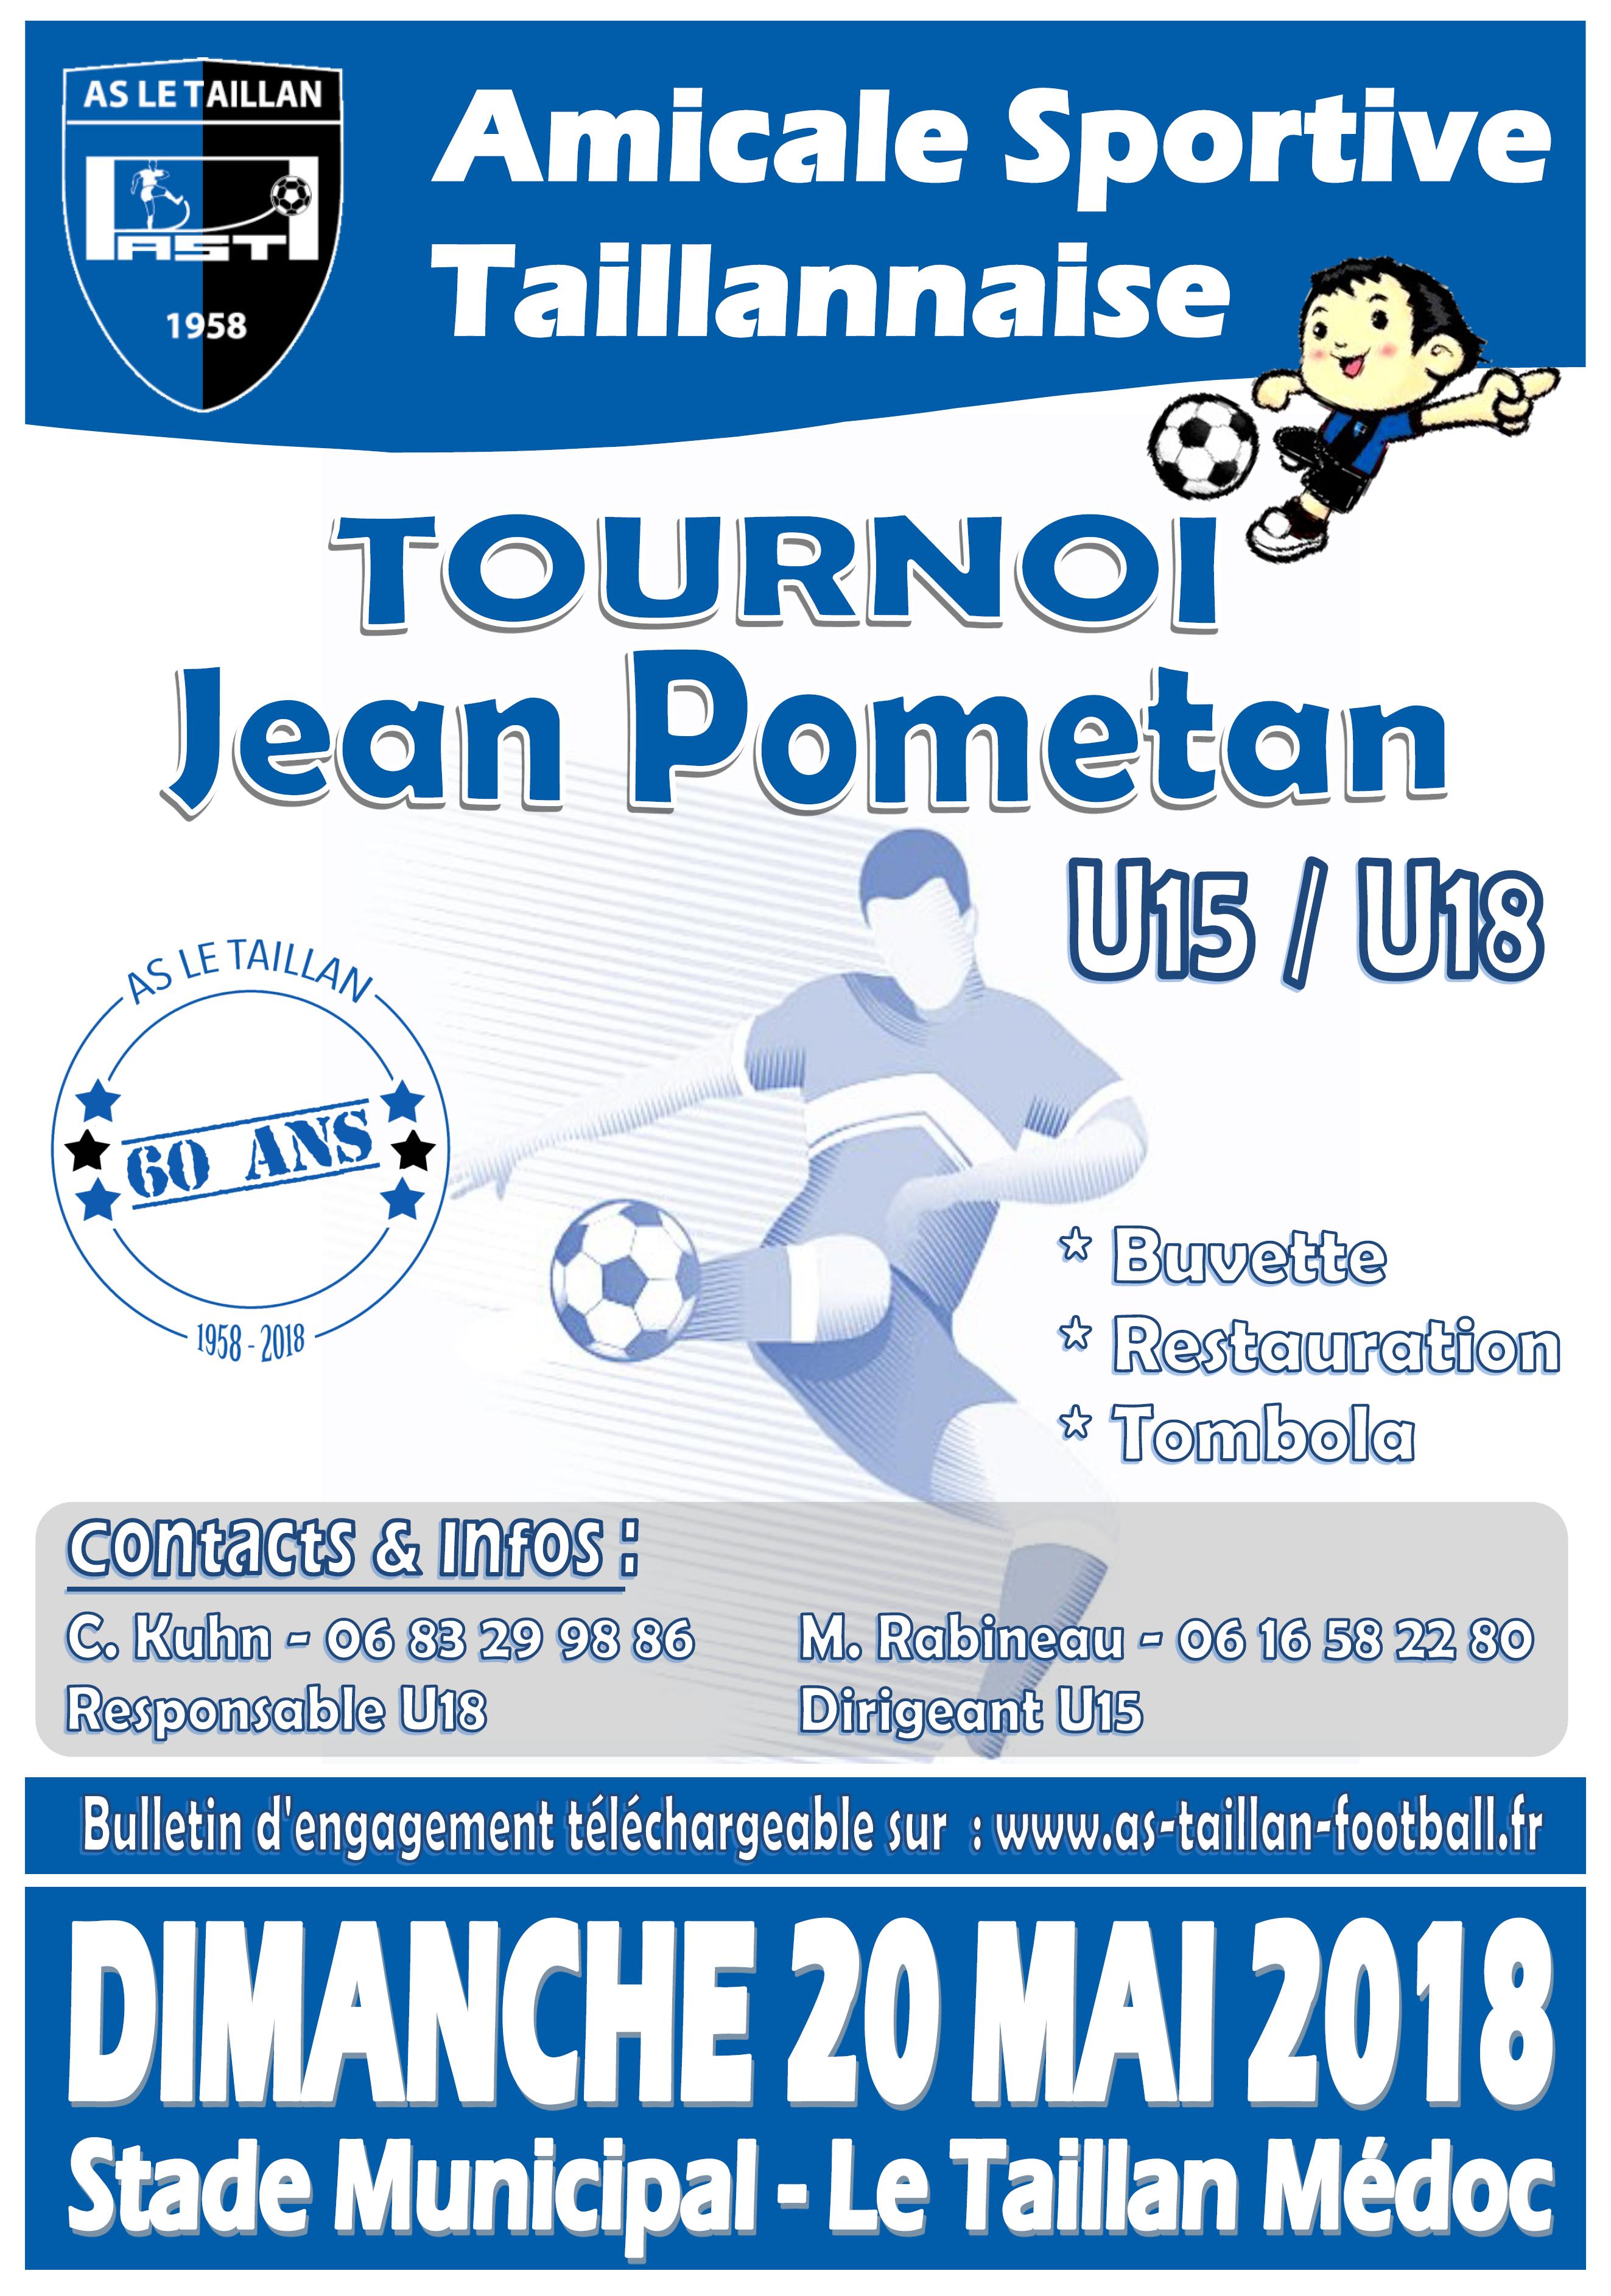 TOURNOI_AST_2018_U15_U18_v2.png